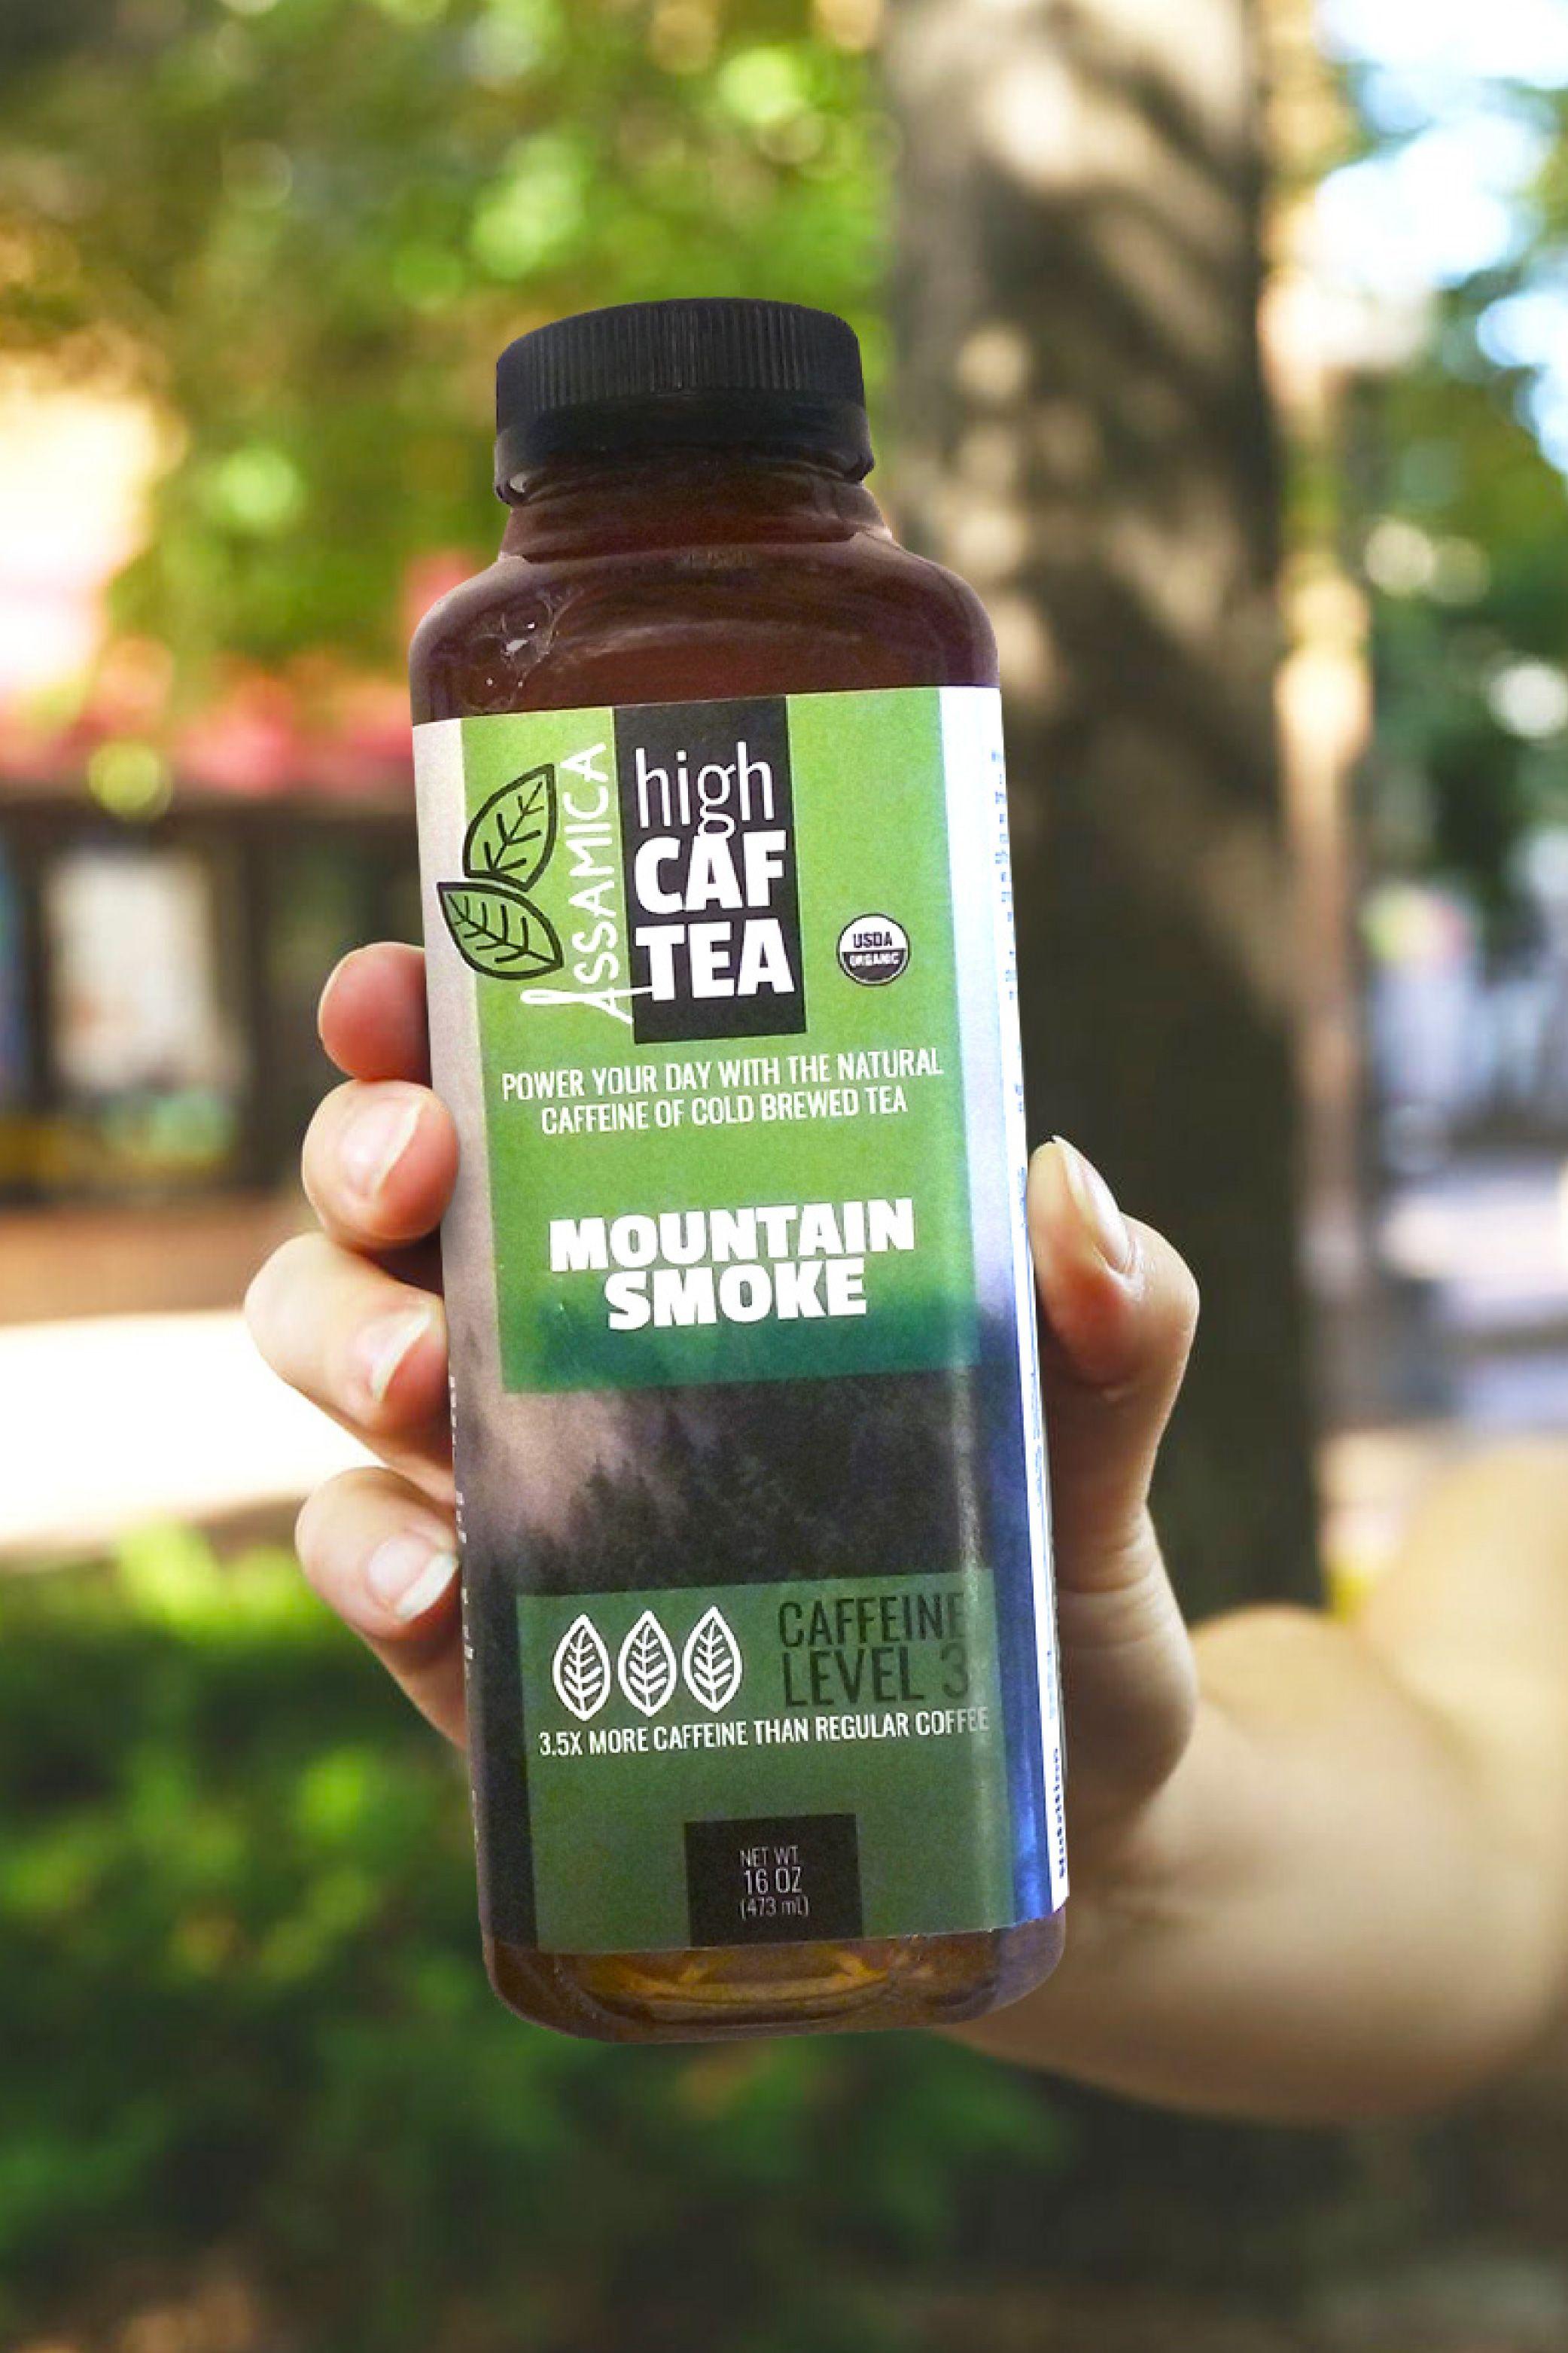 Highcaf tea assamica teas natural caffeine tea